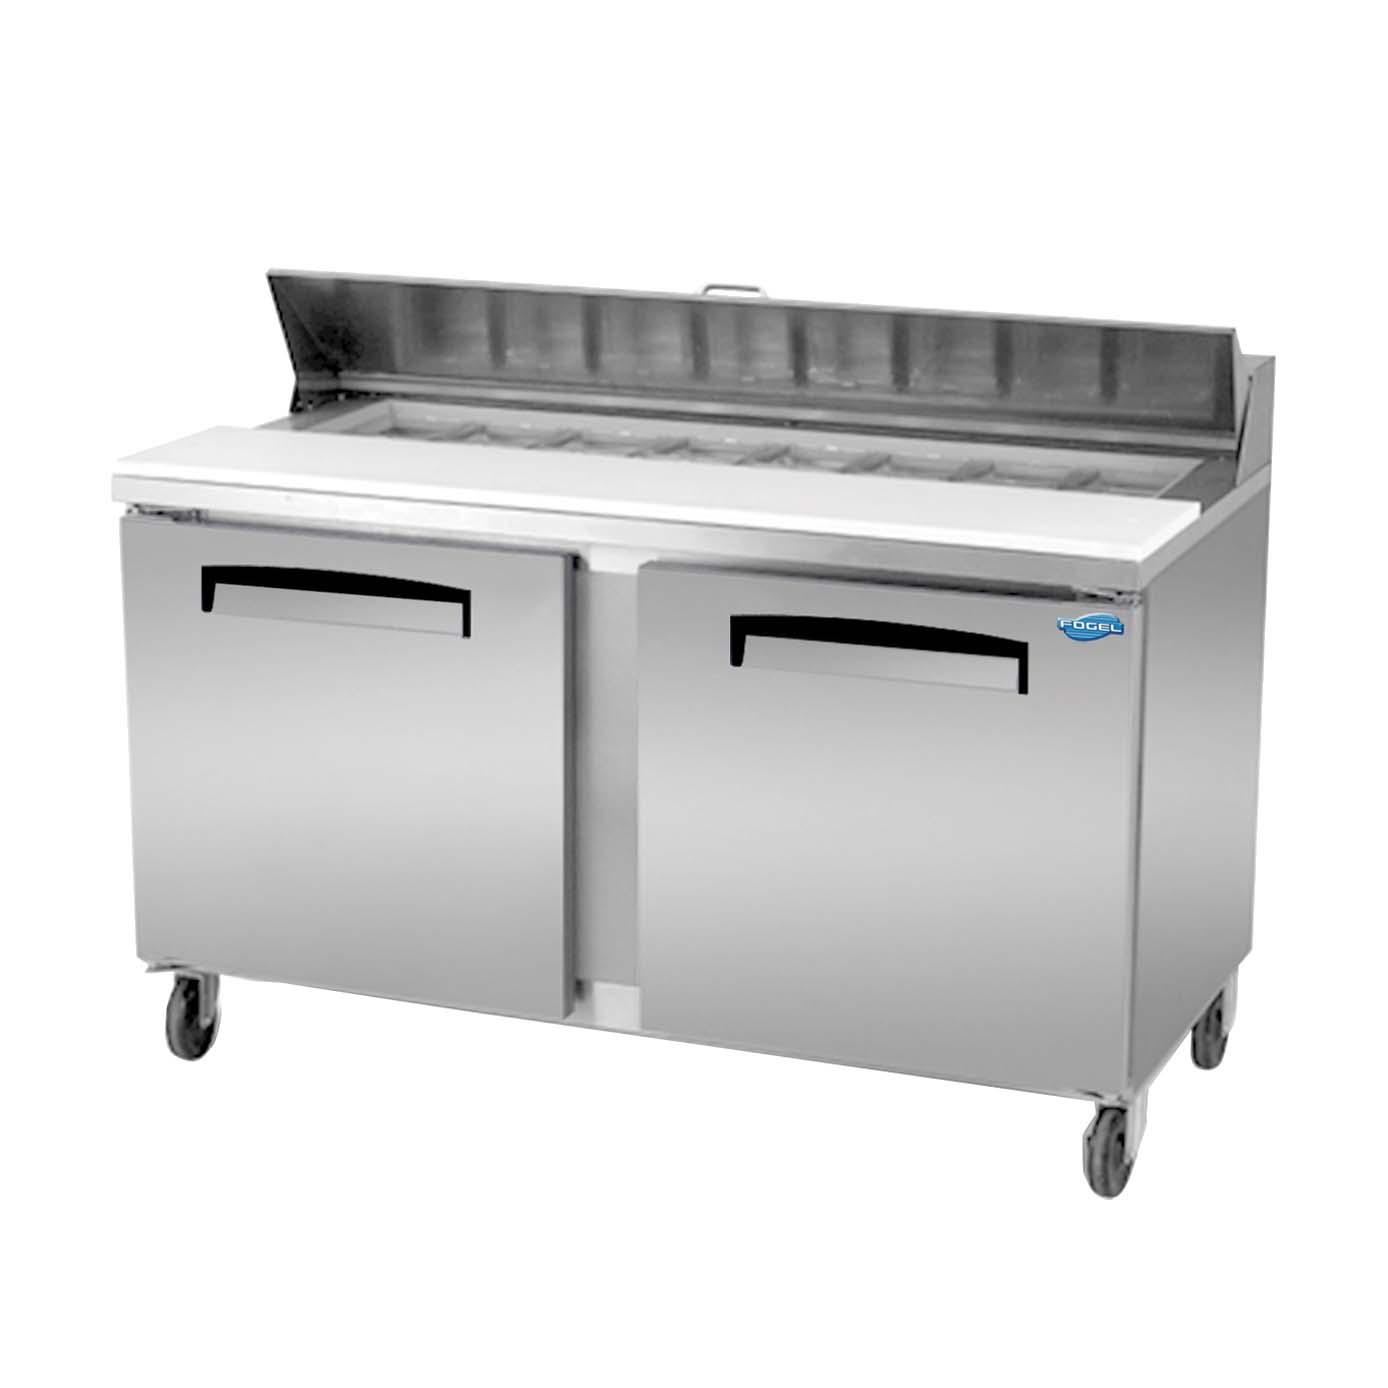 Fogel Refrigeration Flp 59 16 Sandwich Prep Table 15 7